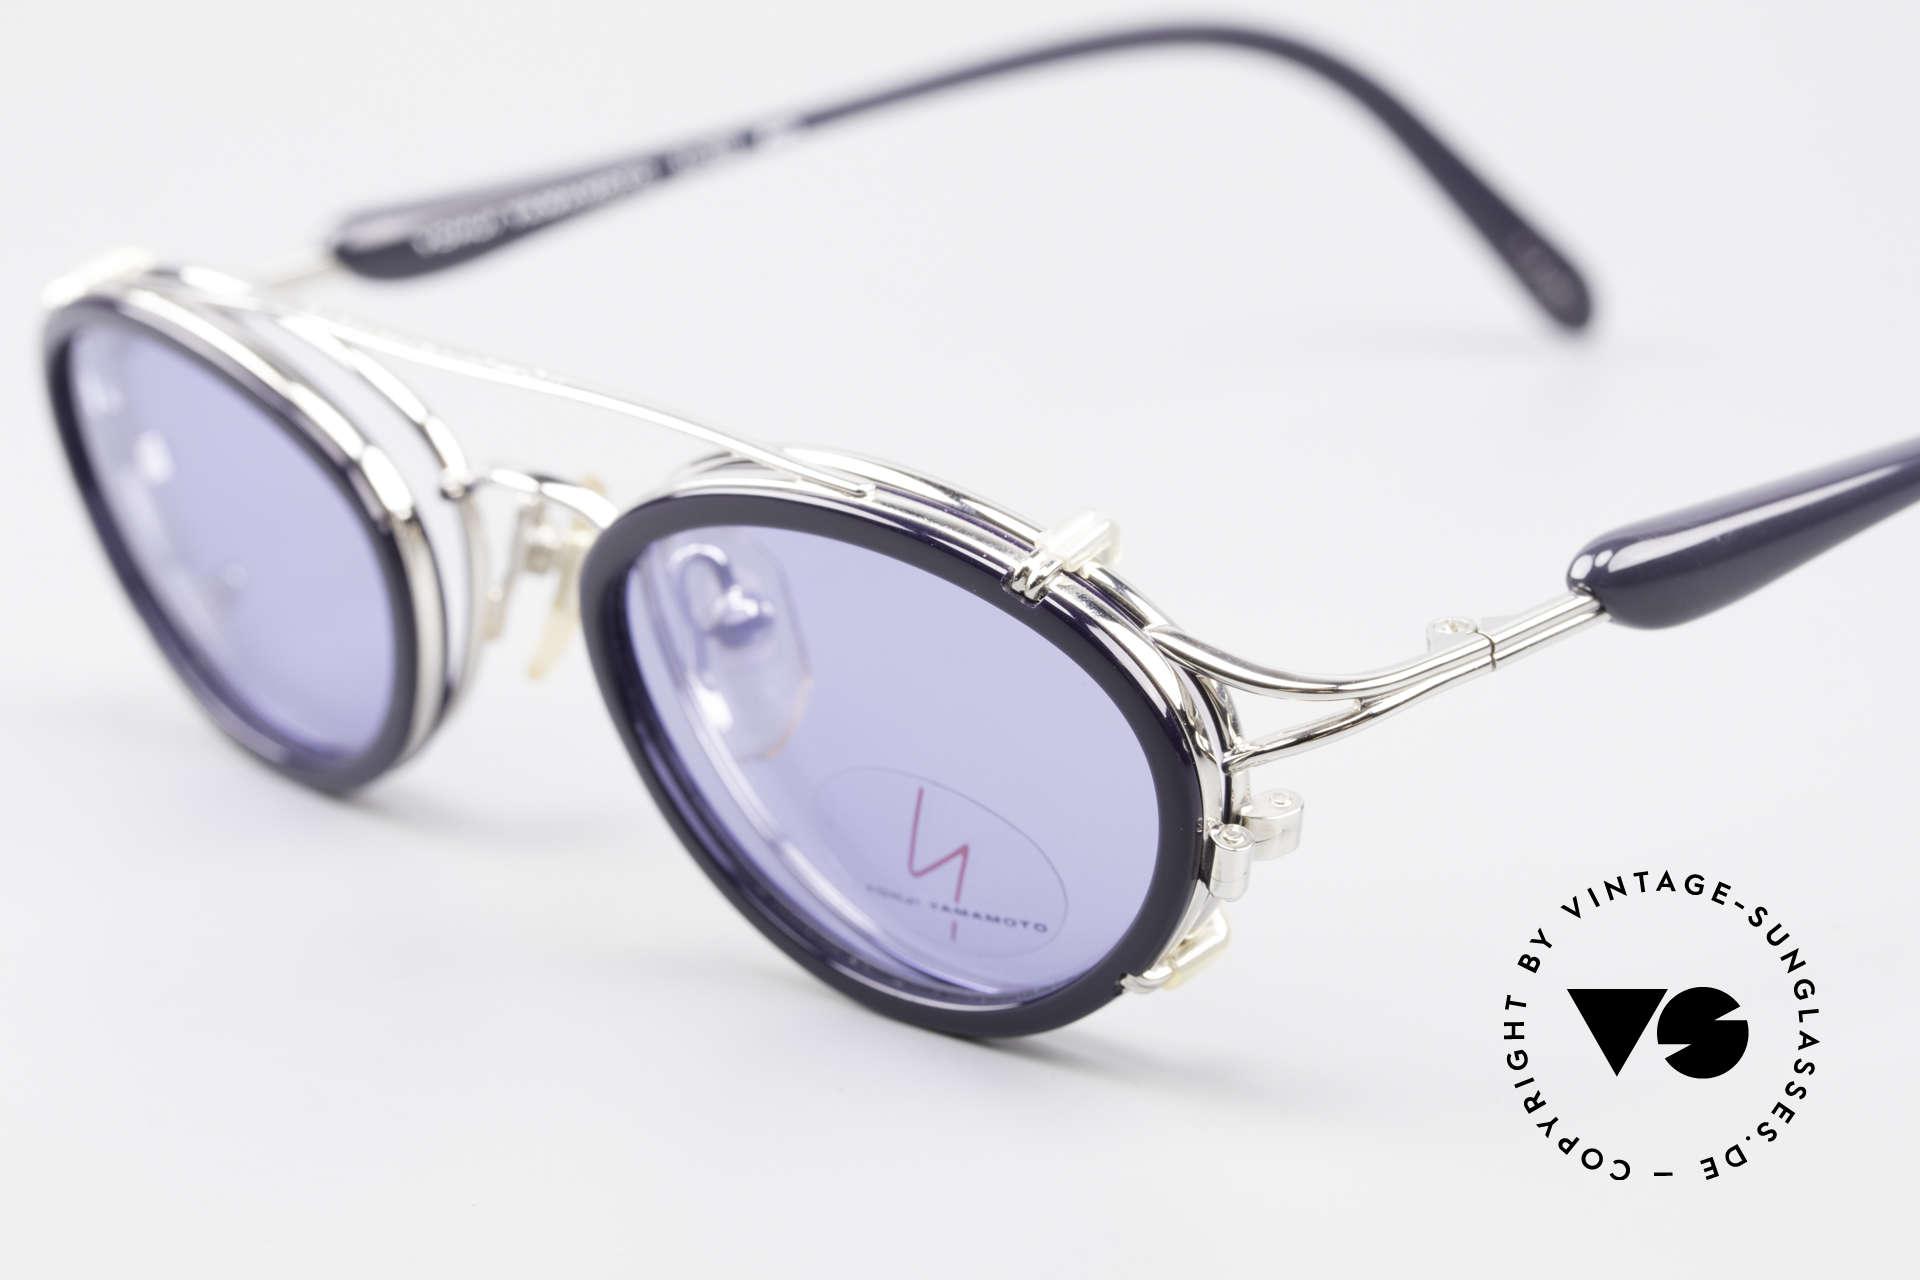 Yohji Yamamoto 51-7210 Clip-On 90's No Retro Shades, unused (like all our Haute Couture designer glasses), Made for Men and Women